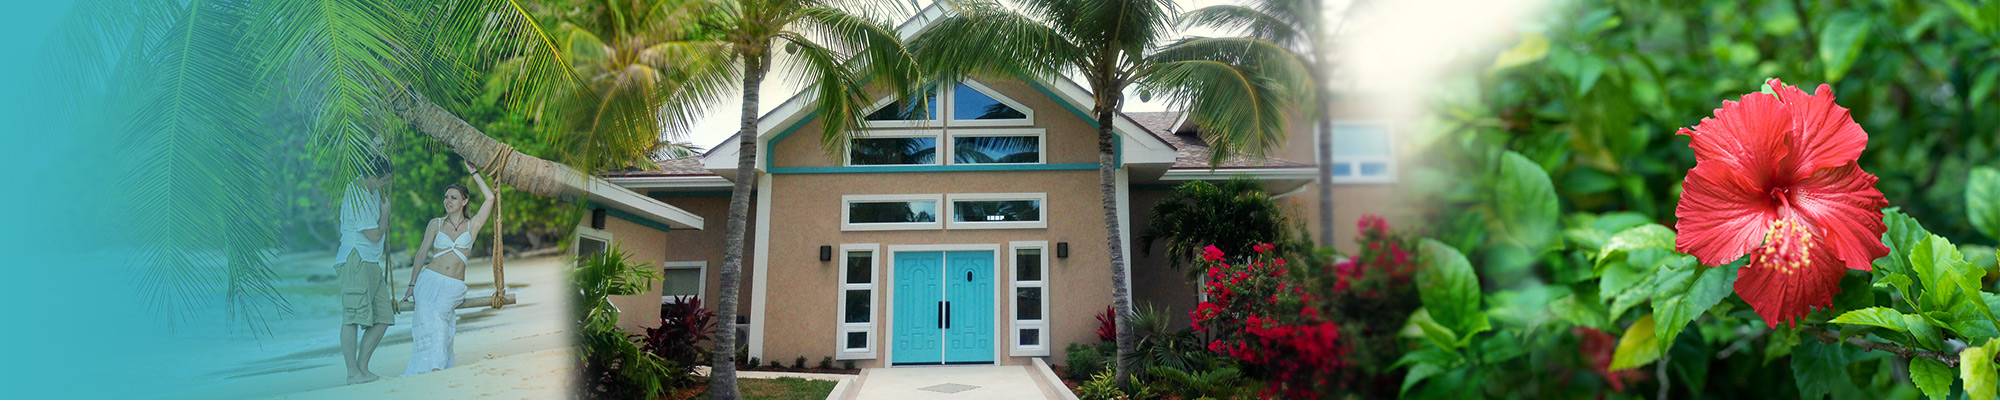 Residential projects - Aqua Terra Exuma house